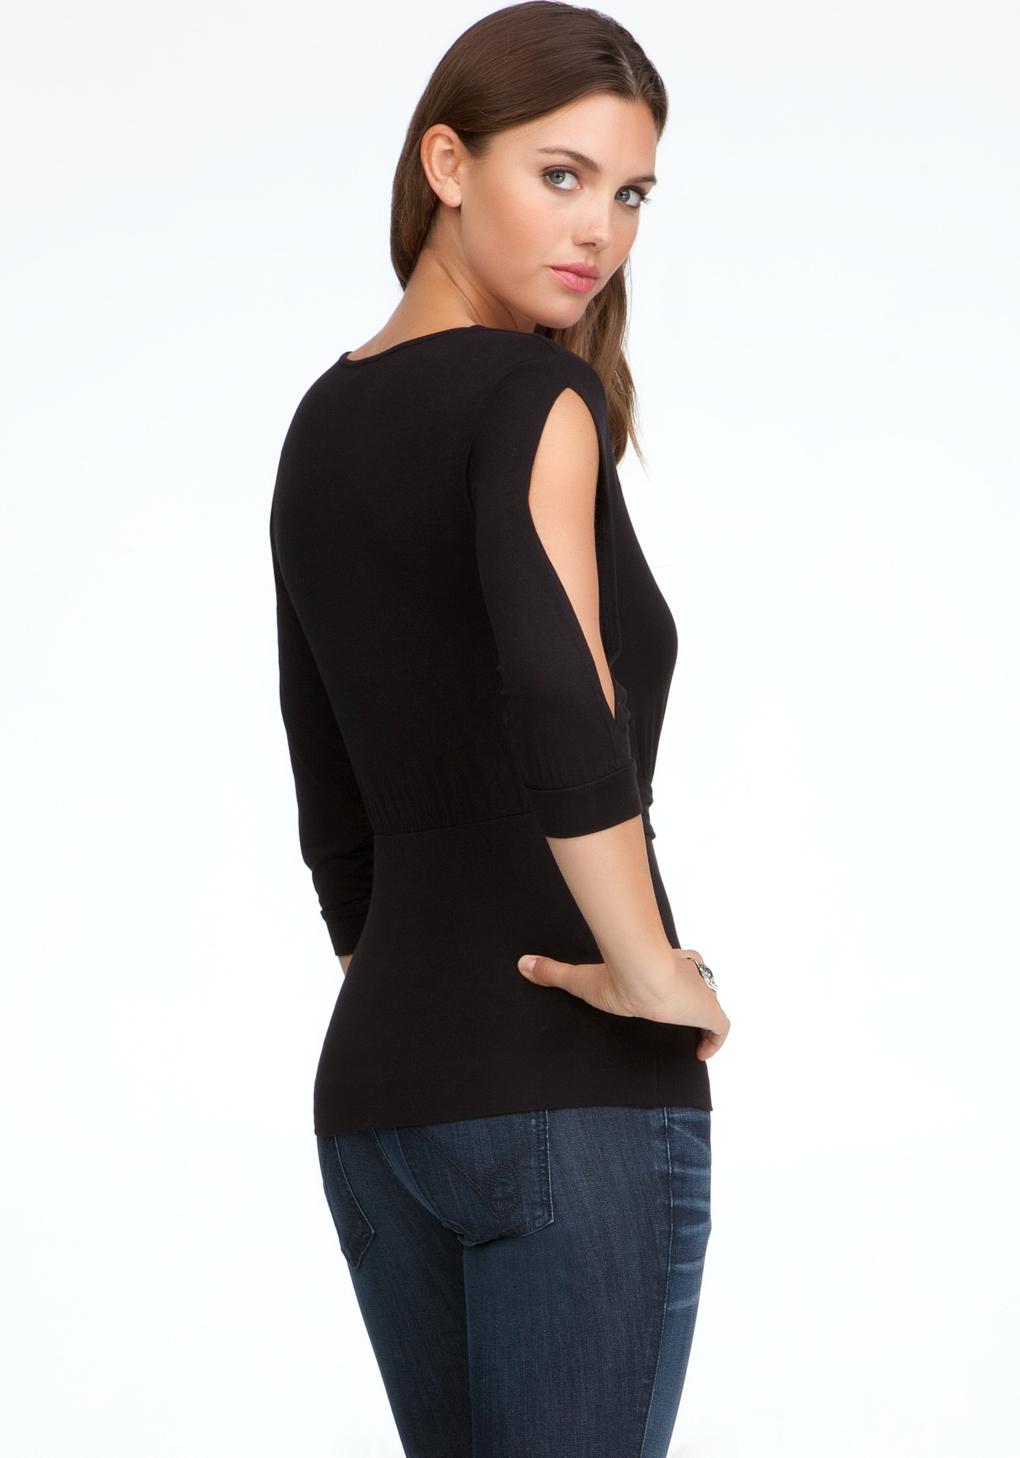 Bebe Slit Sleeve Tie Front Knit Top in Black | Lyst